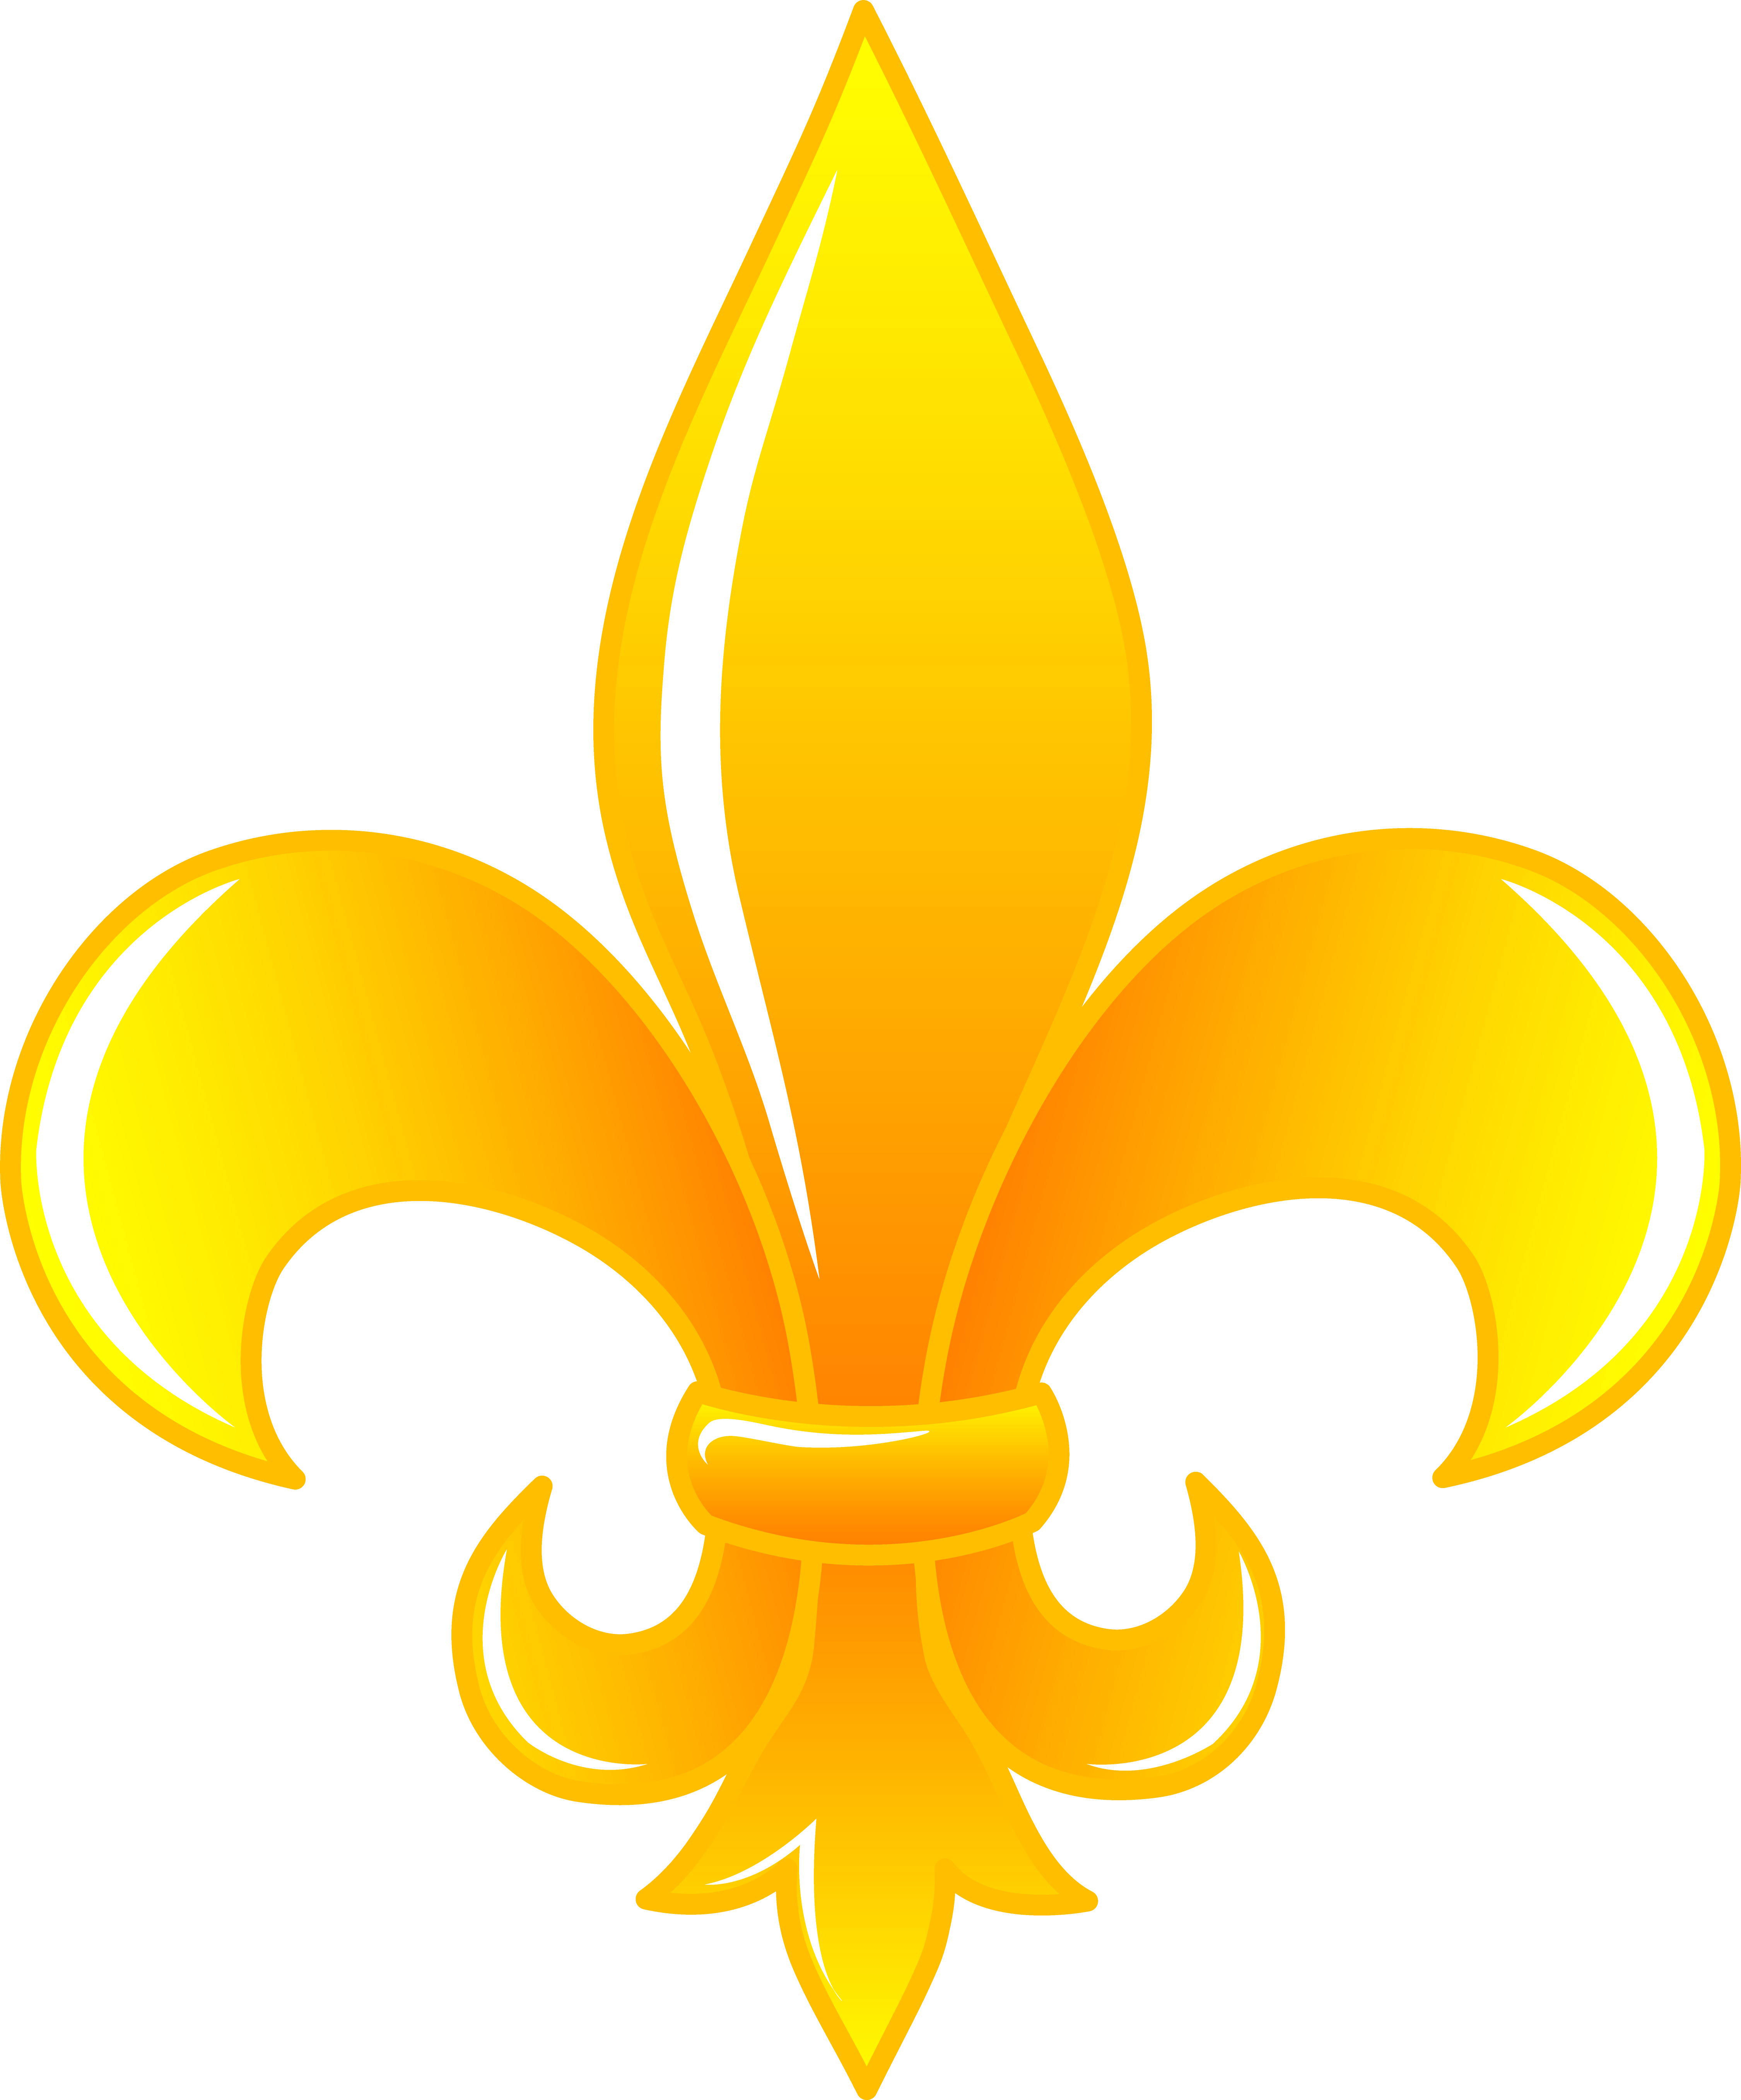 Painting symbol